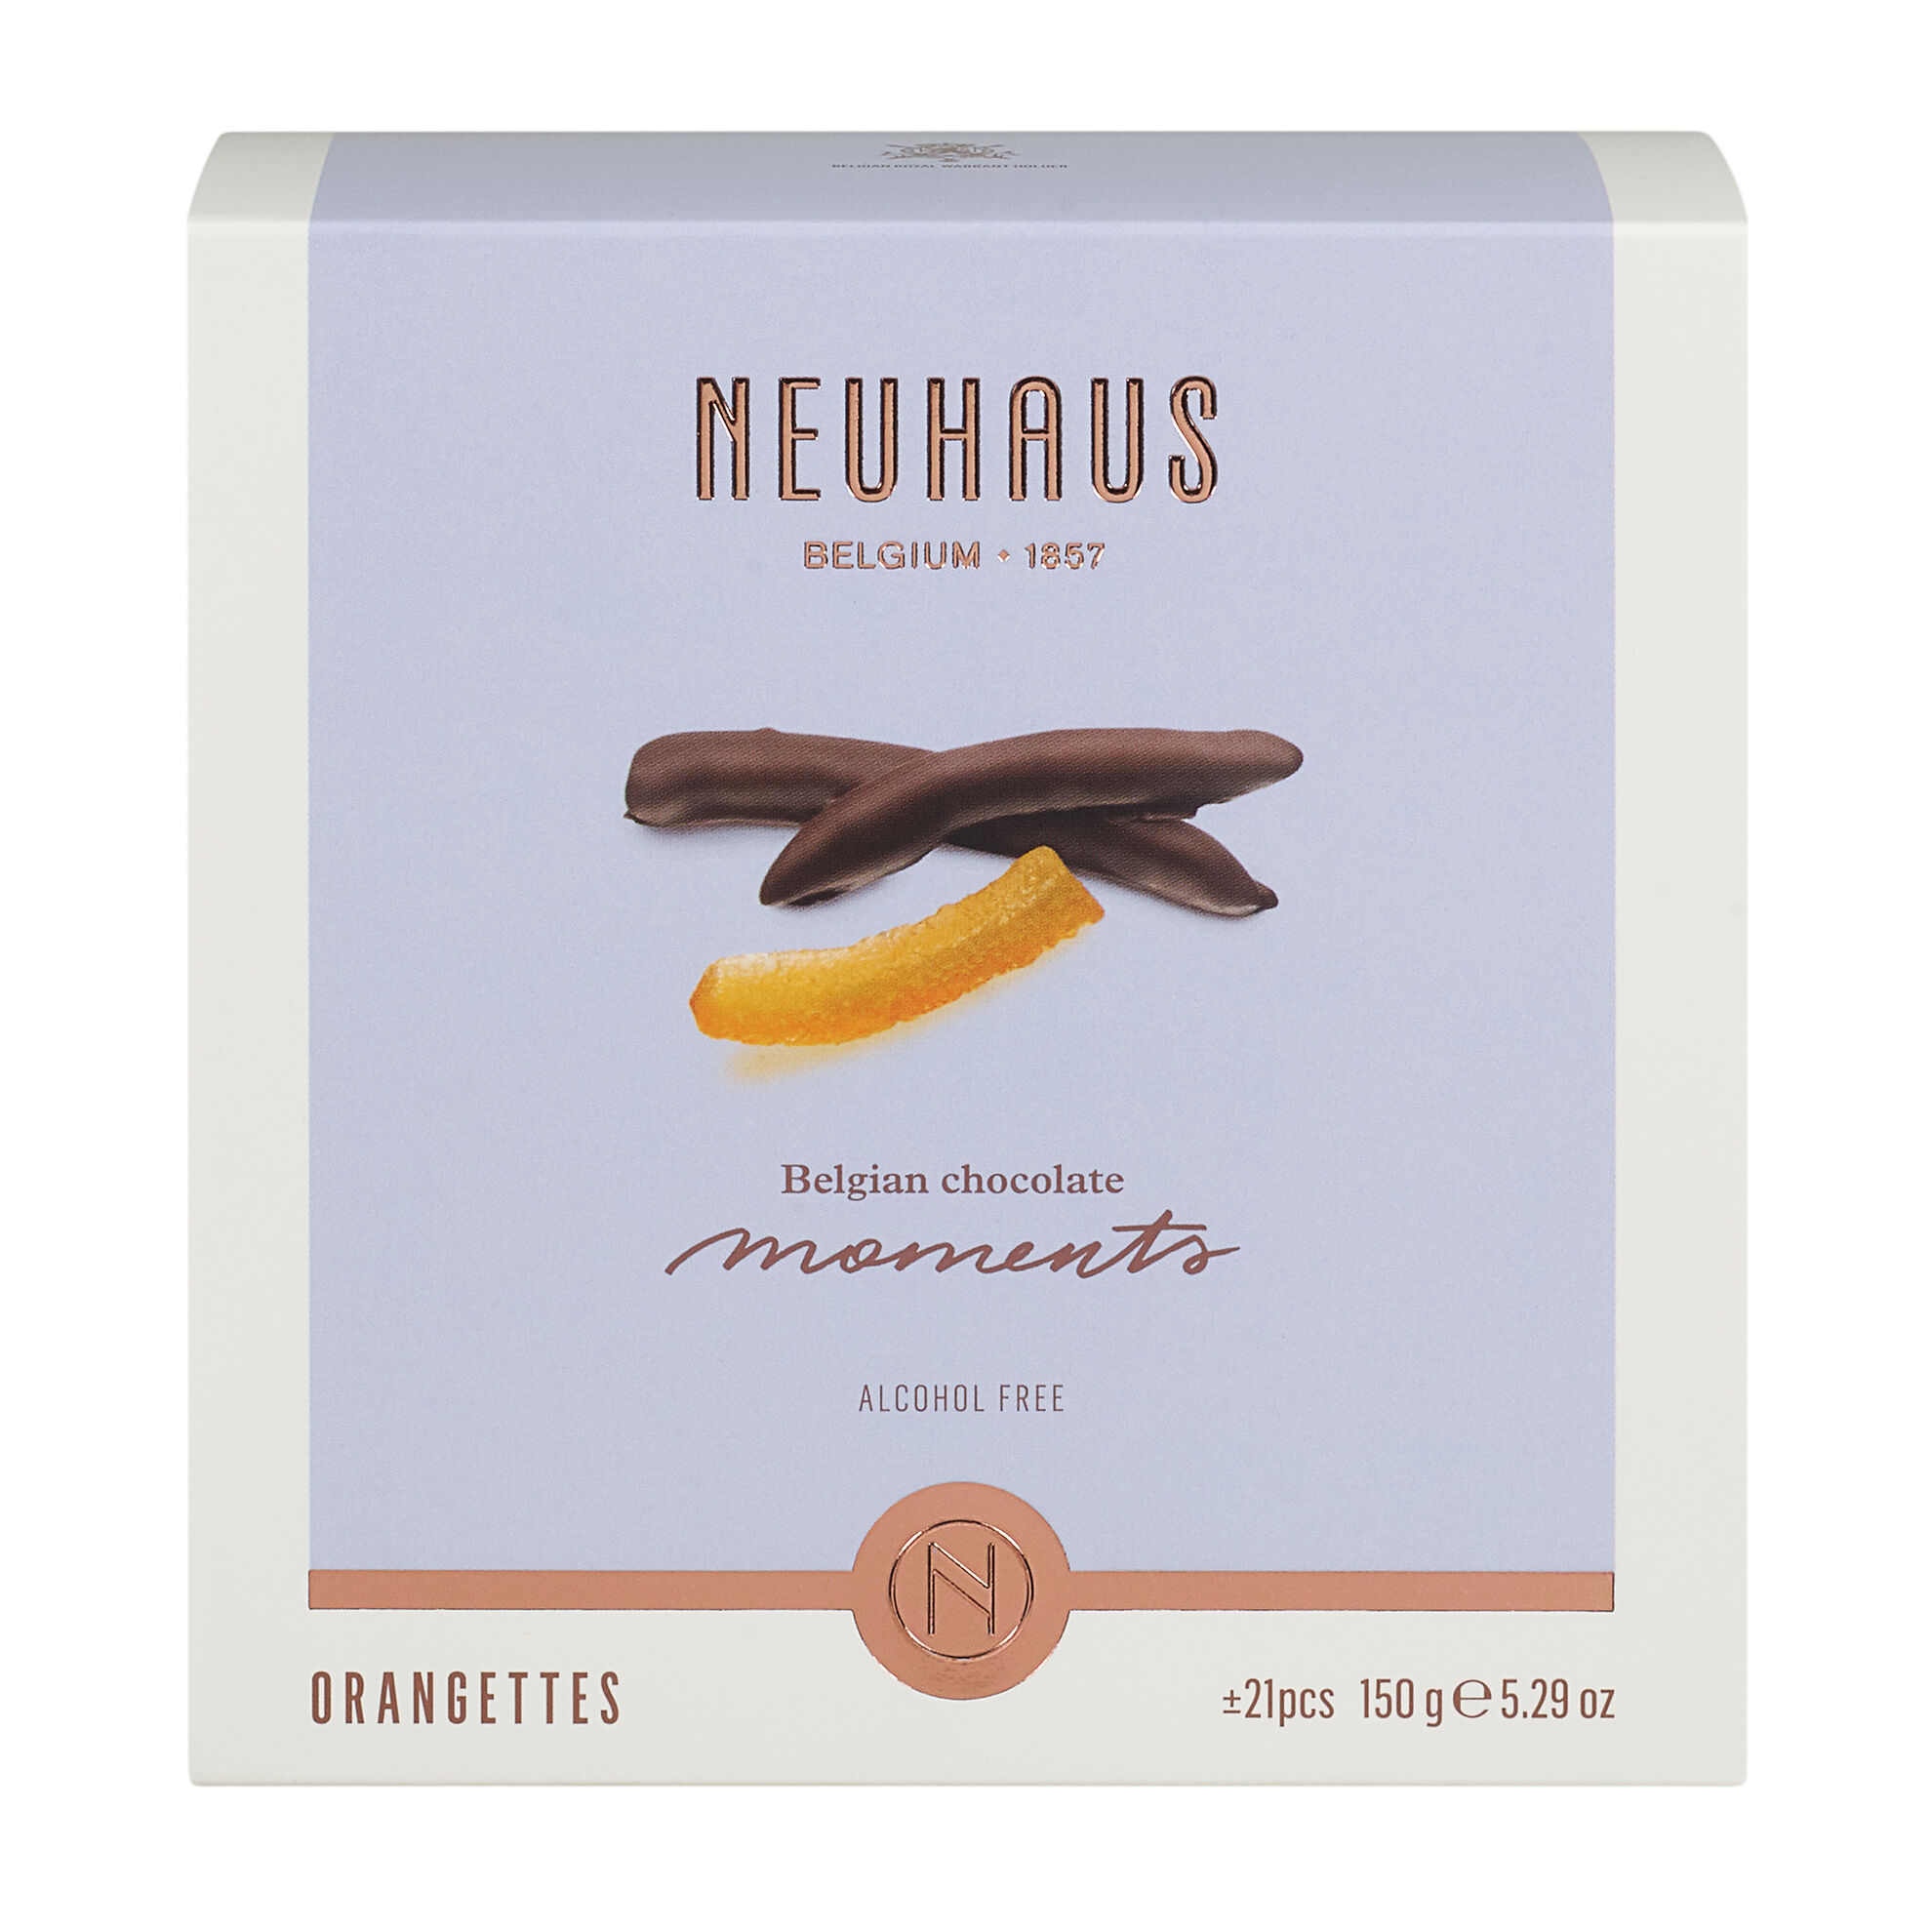 Belgian Chocolate Moments - Orangettes image number 01